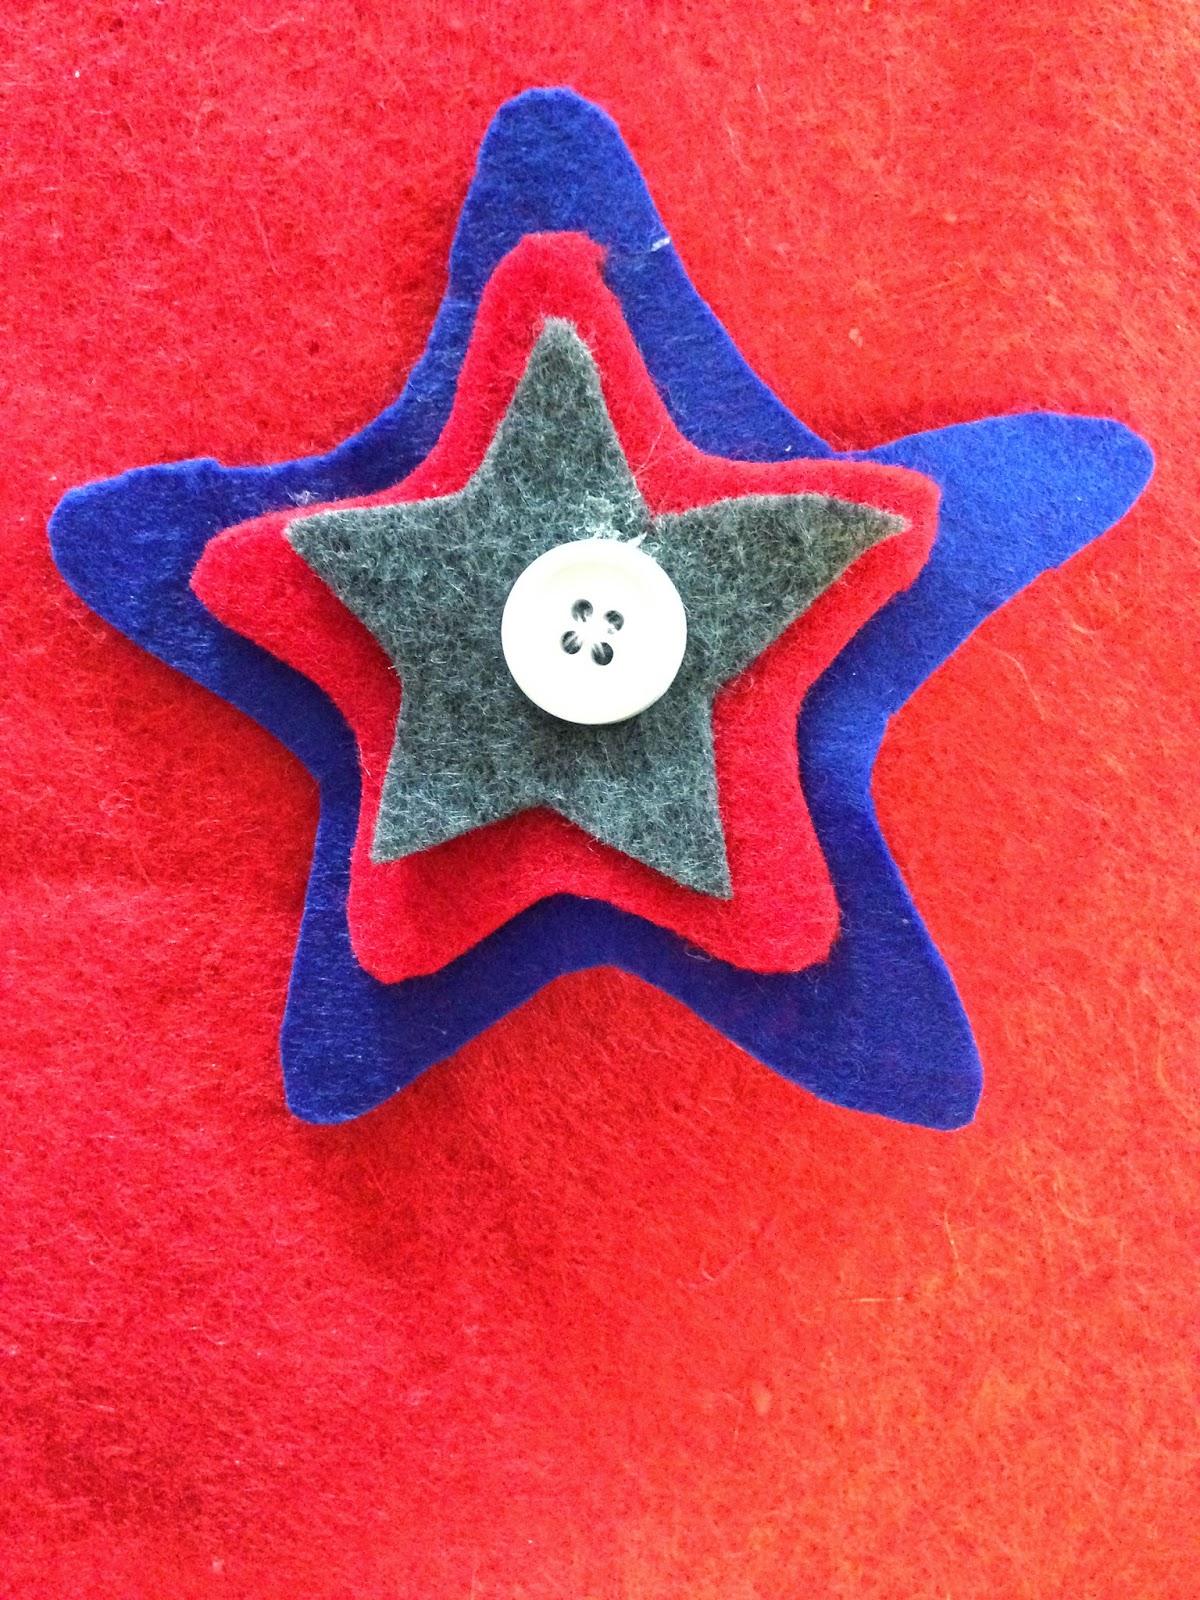 Tutorial for Patriotic Felt Star Hair Clips #tutorial #fourthofjuly #crafts #kids #hair